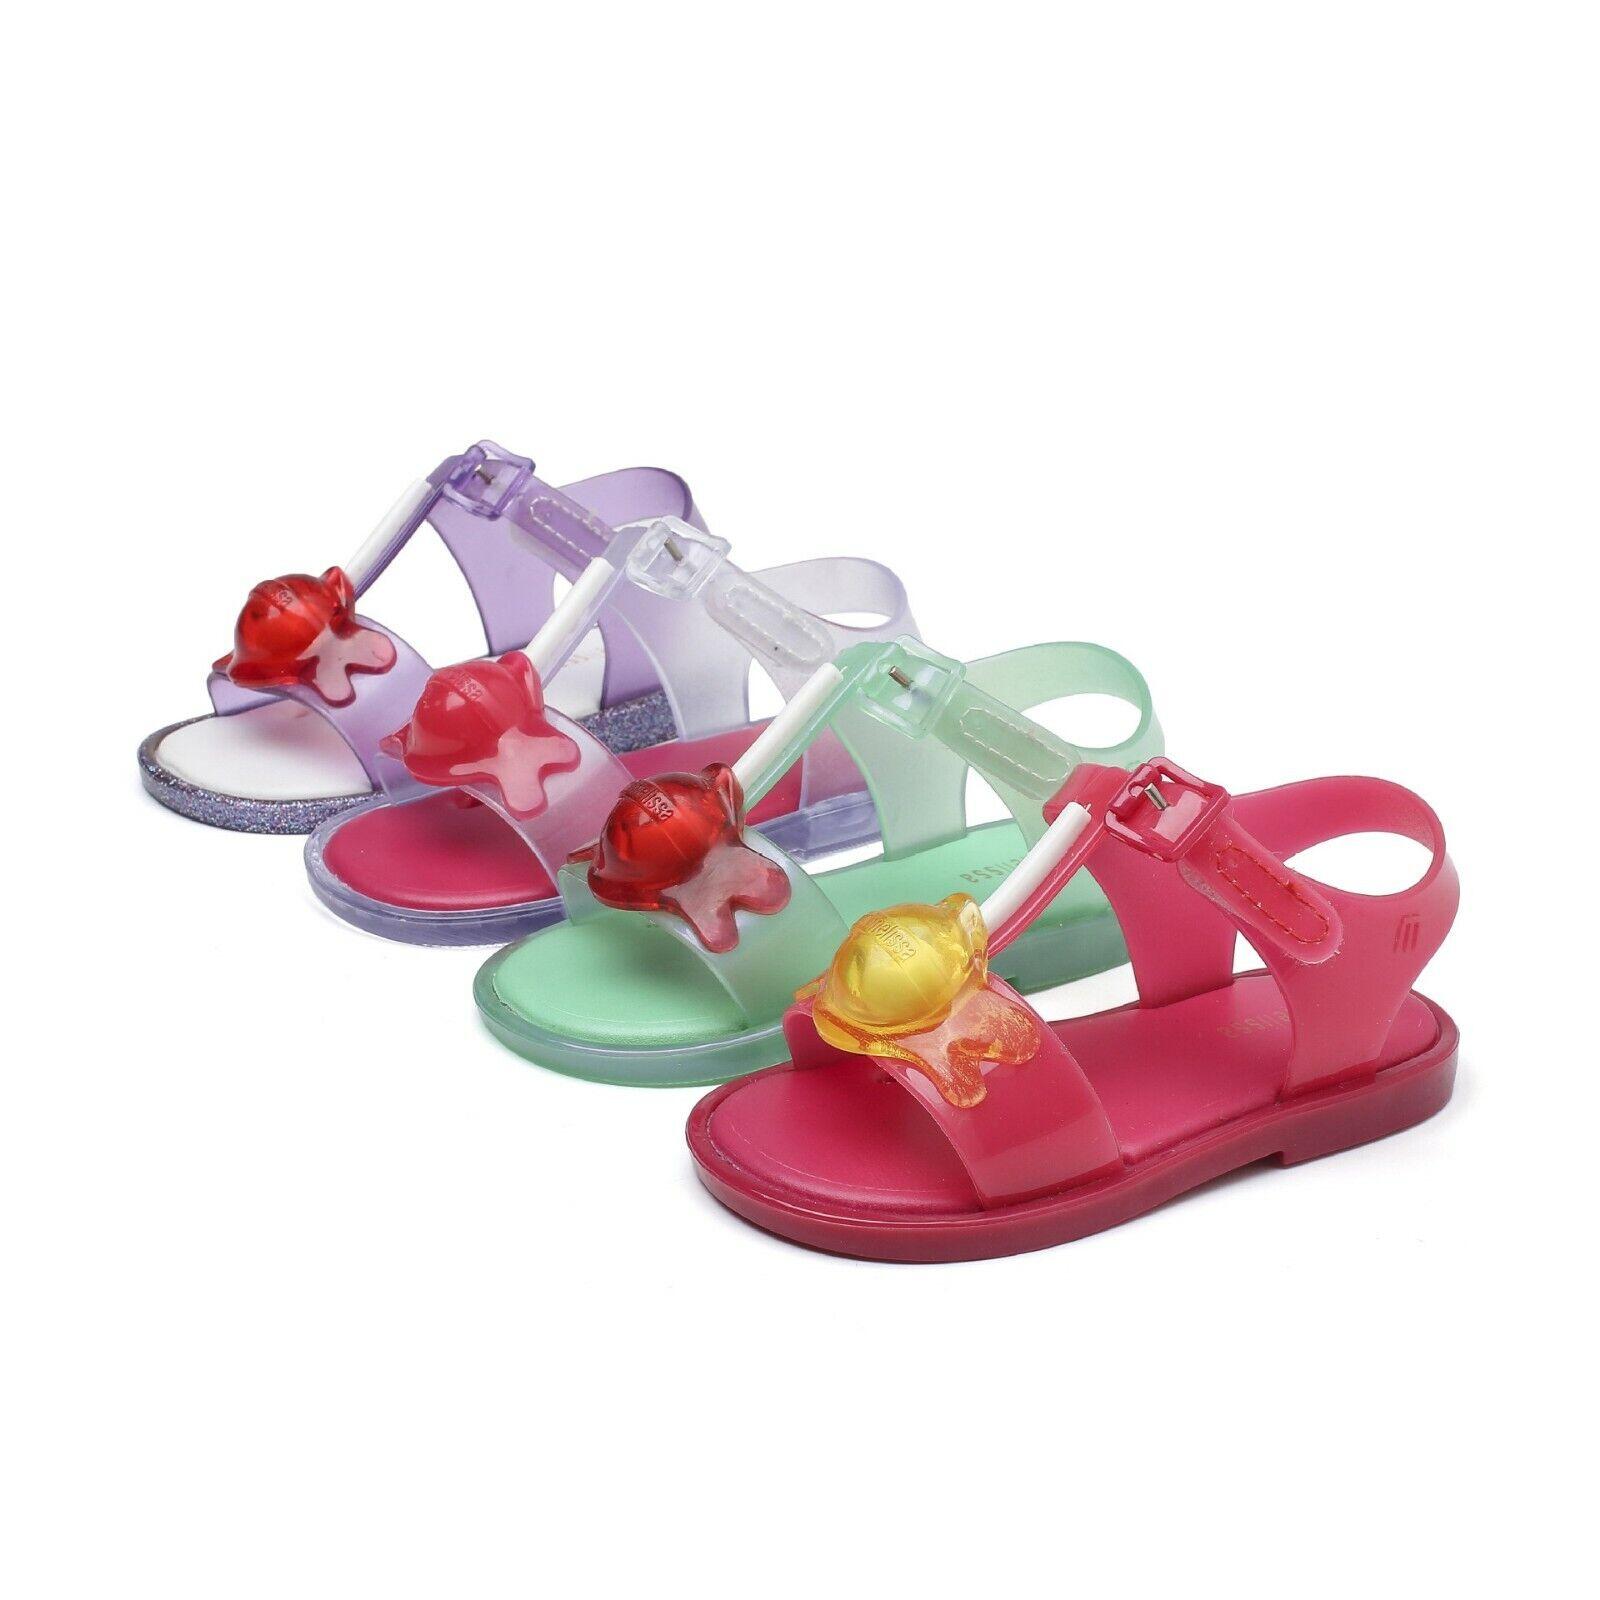 Nice Birdnest Girls Mini Melissa Summer Shoes Sandals Toddlers US Size 7-12